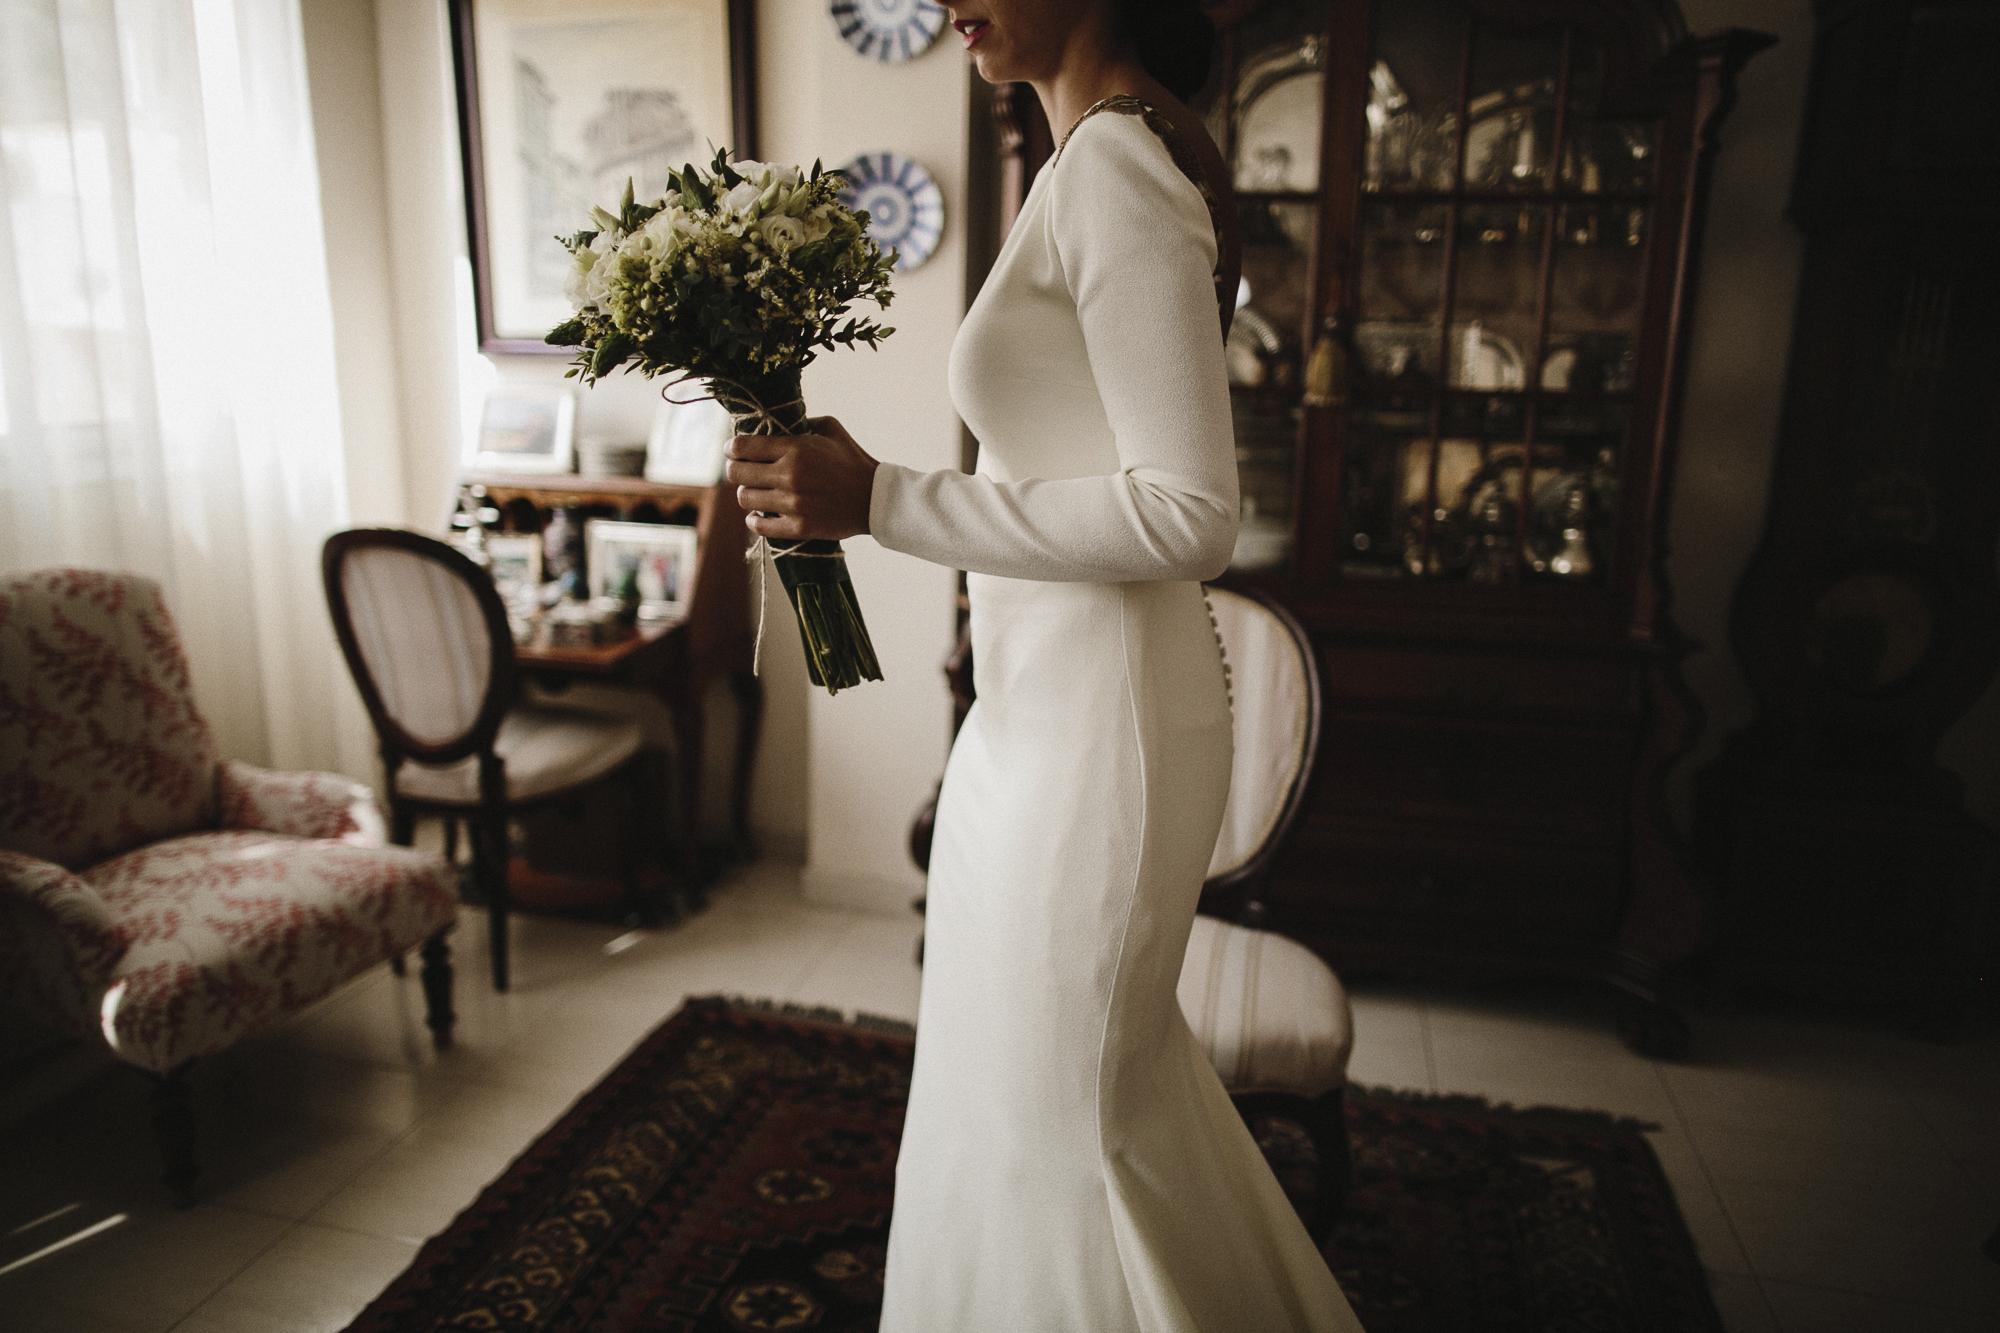 alfonso_flores_destination_wedding_photogrpaher_españa-35.jpg